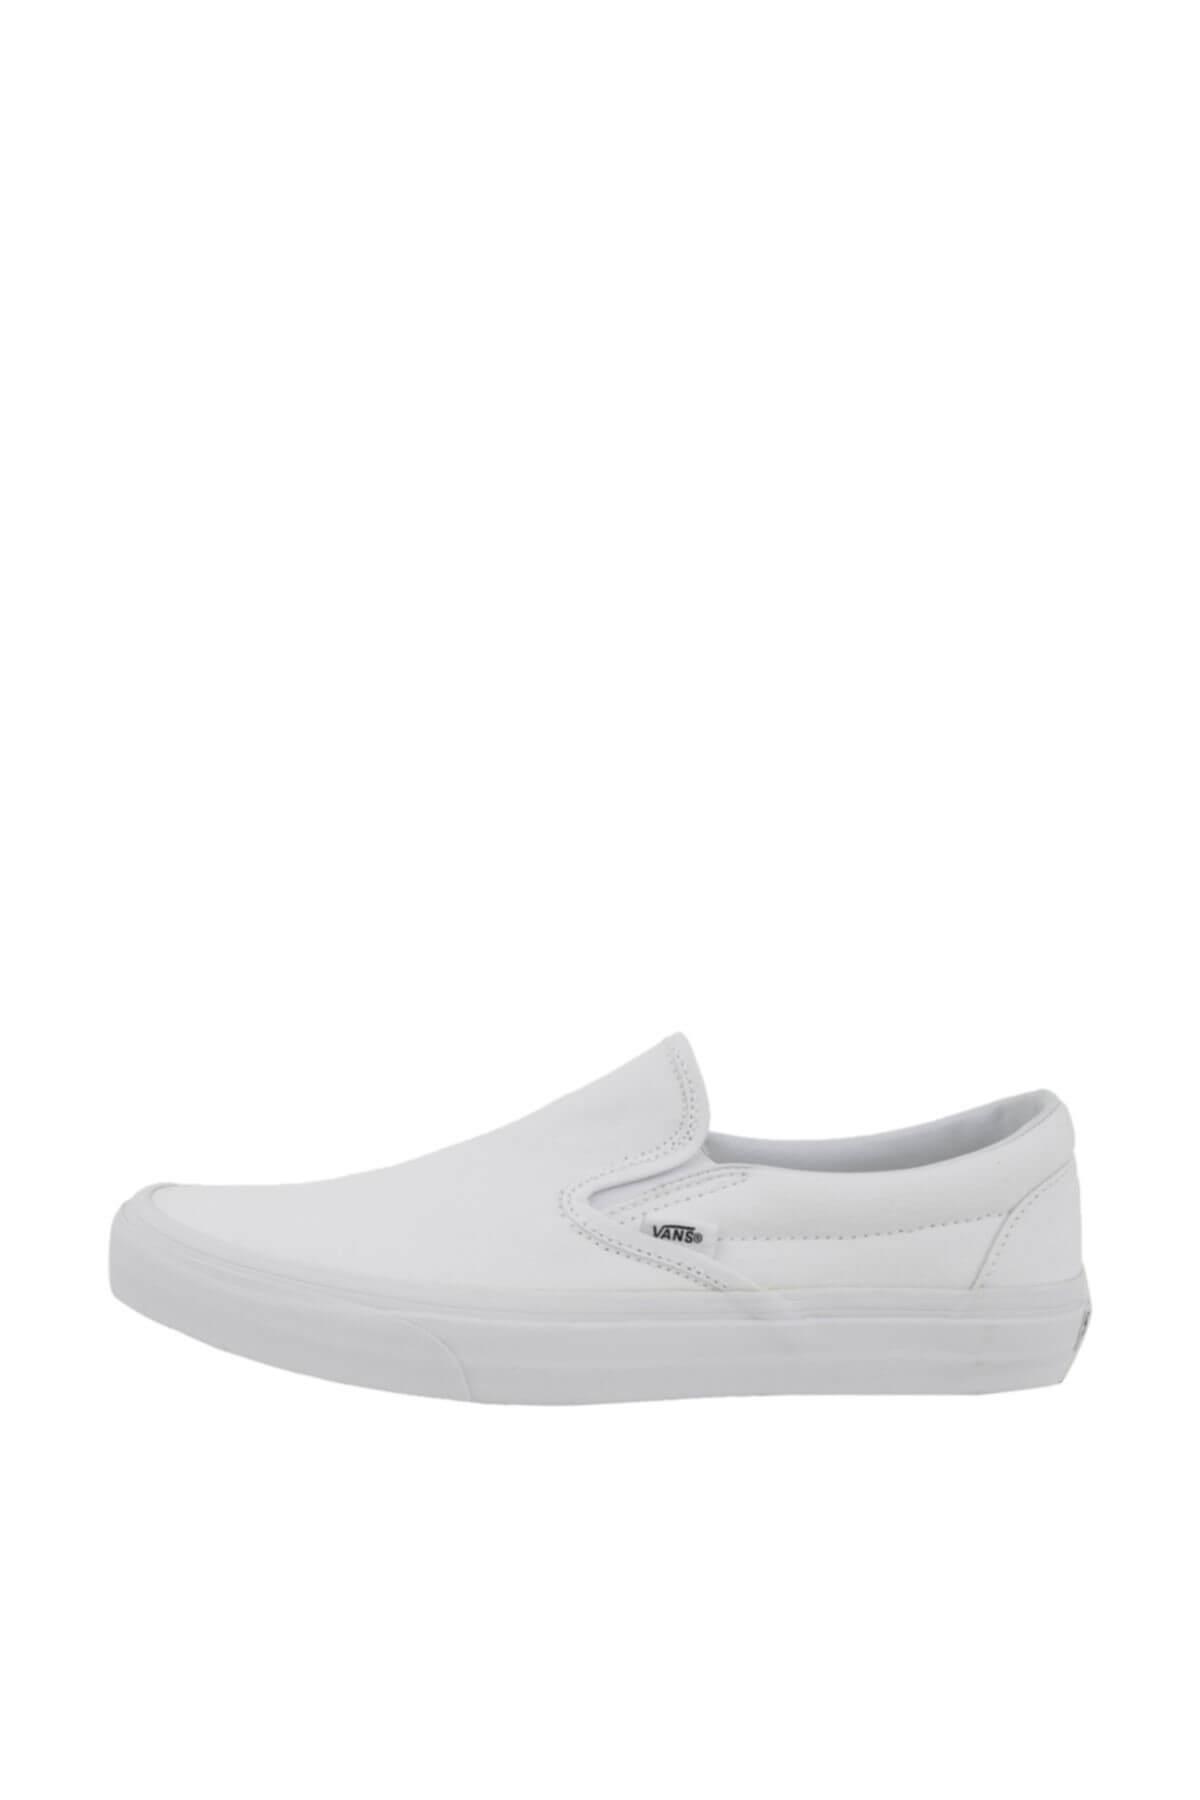 Vans Unisex Sneaker - Classic Slip-On - VEYEW00 1